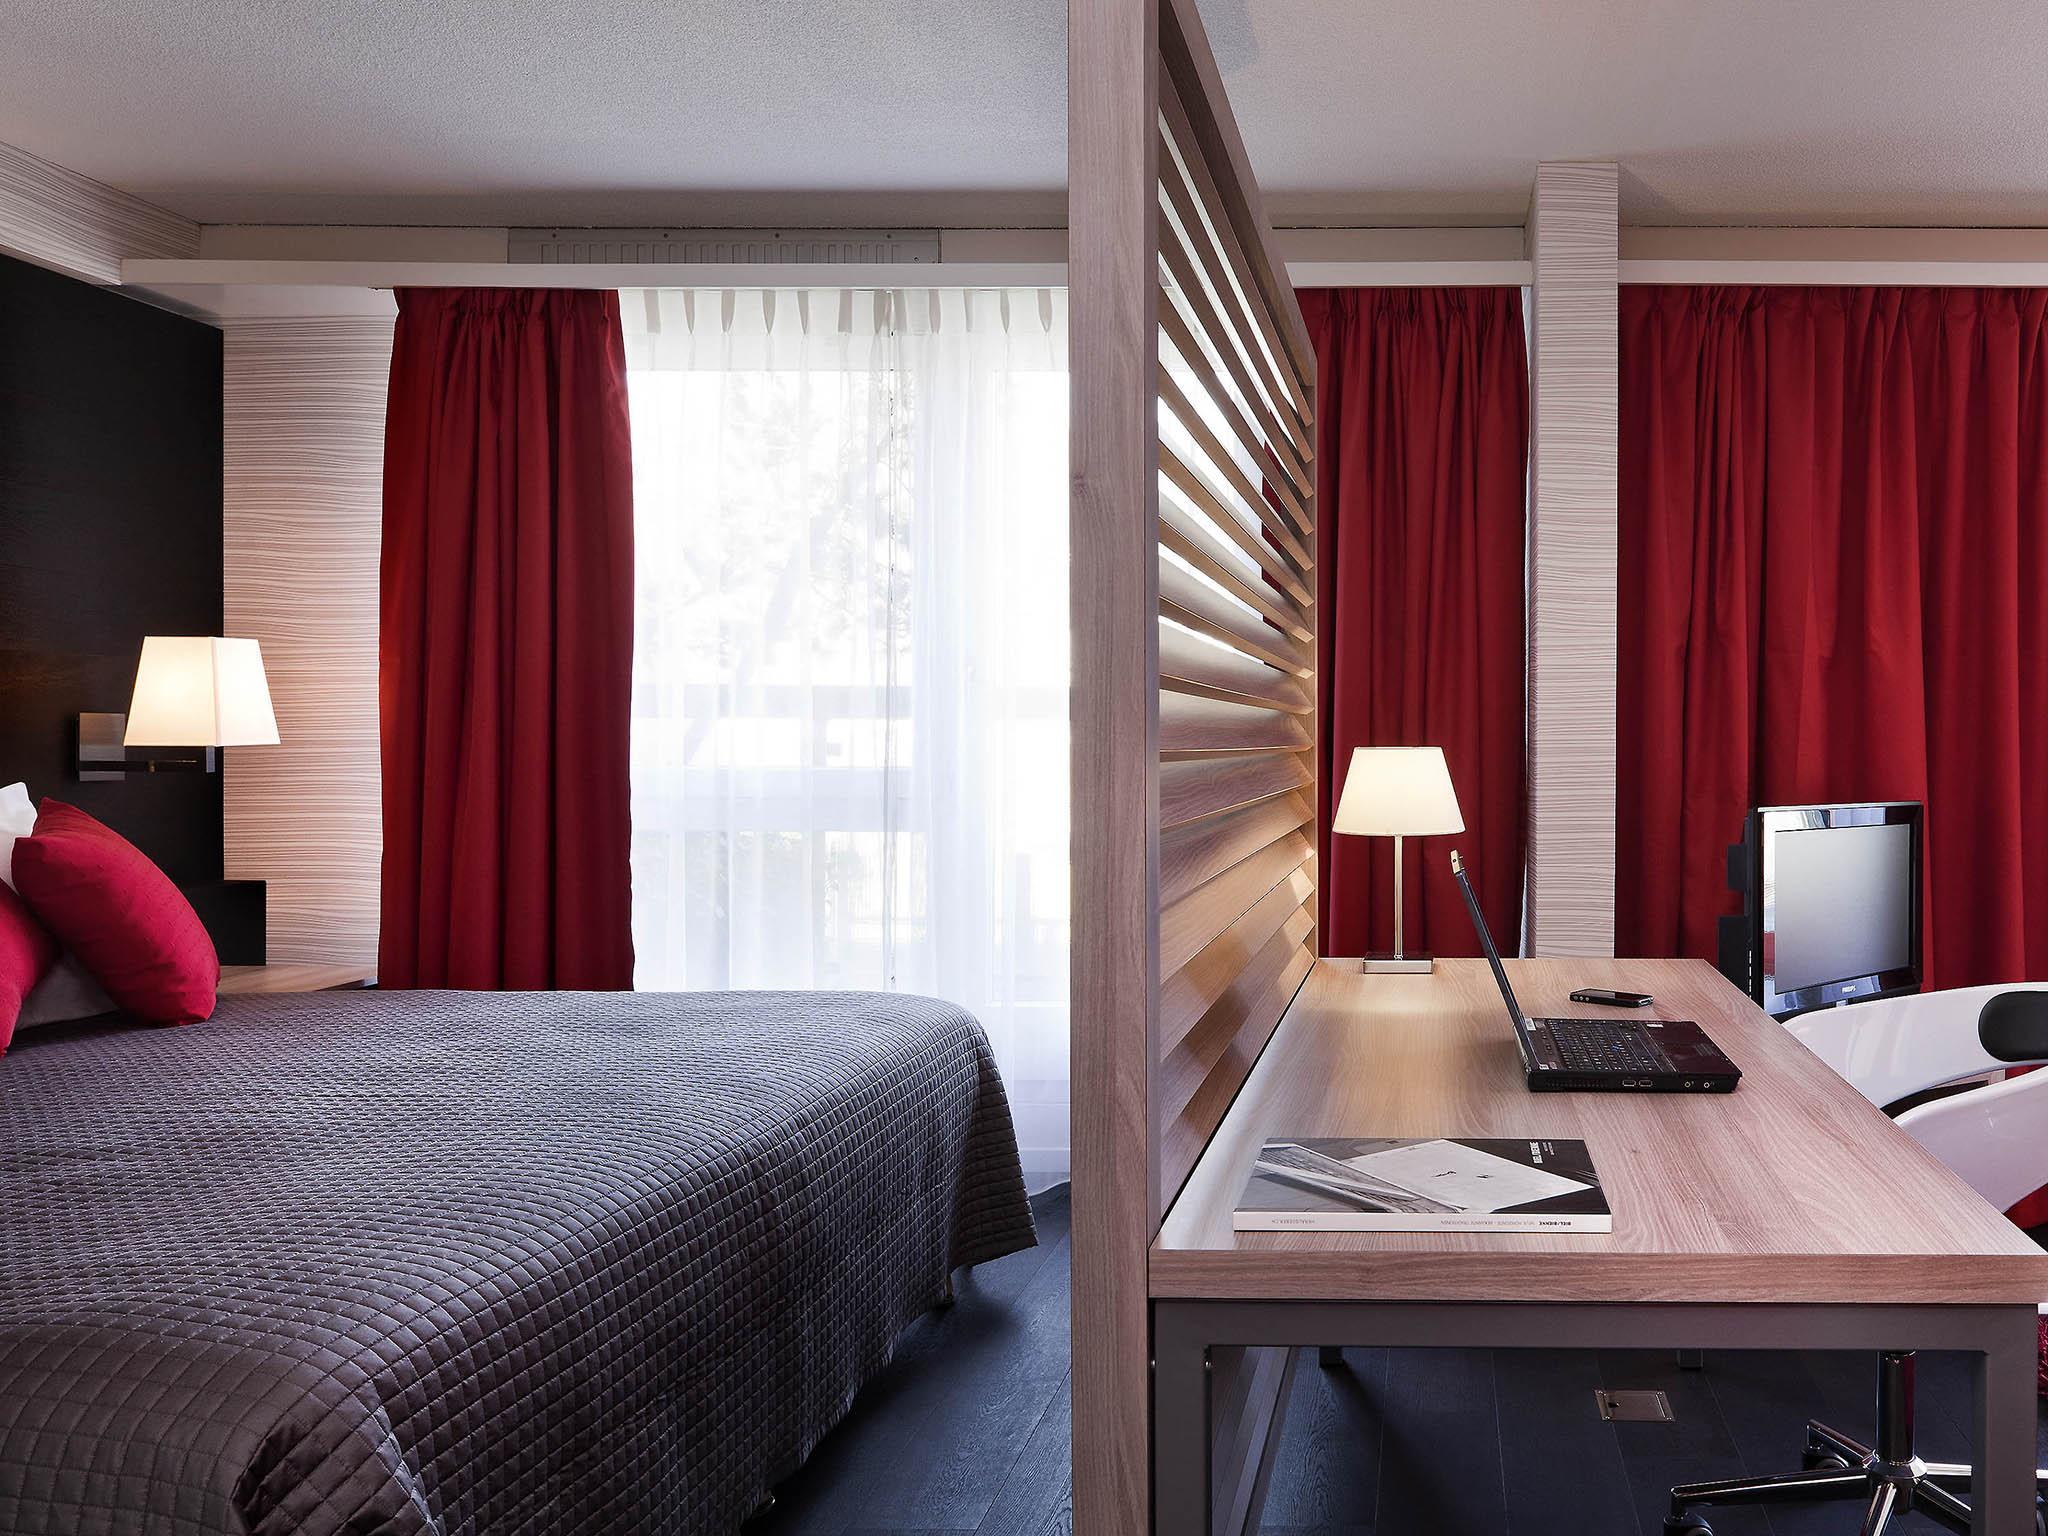 Hotel Mercure Plaza Biel | Accor Hotels